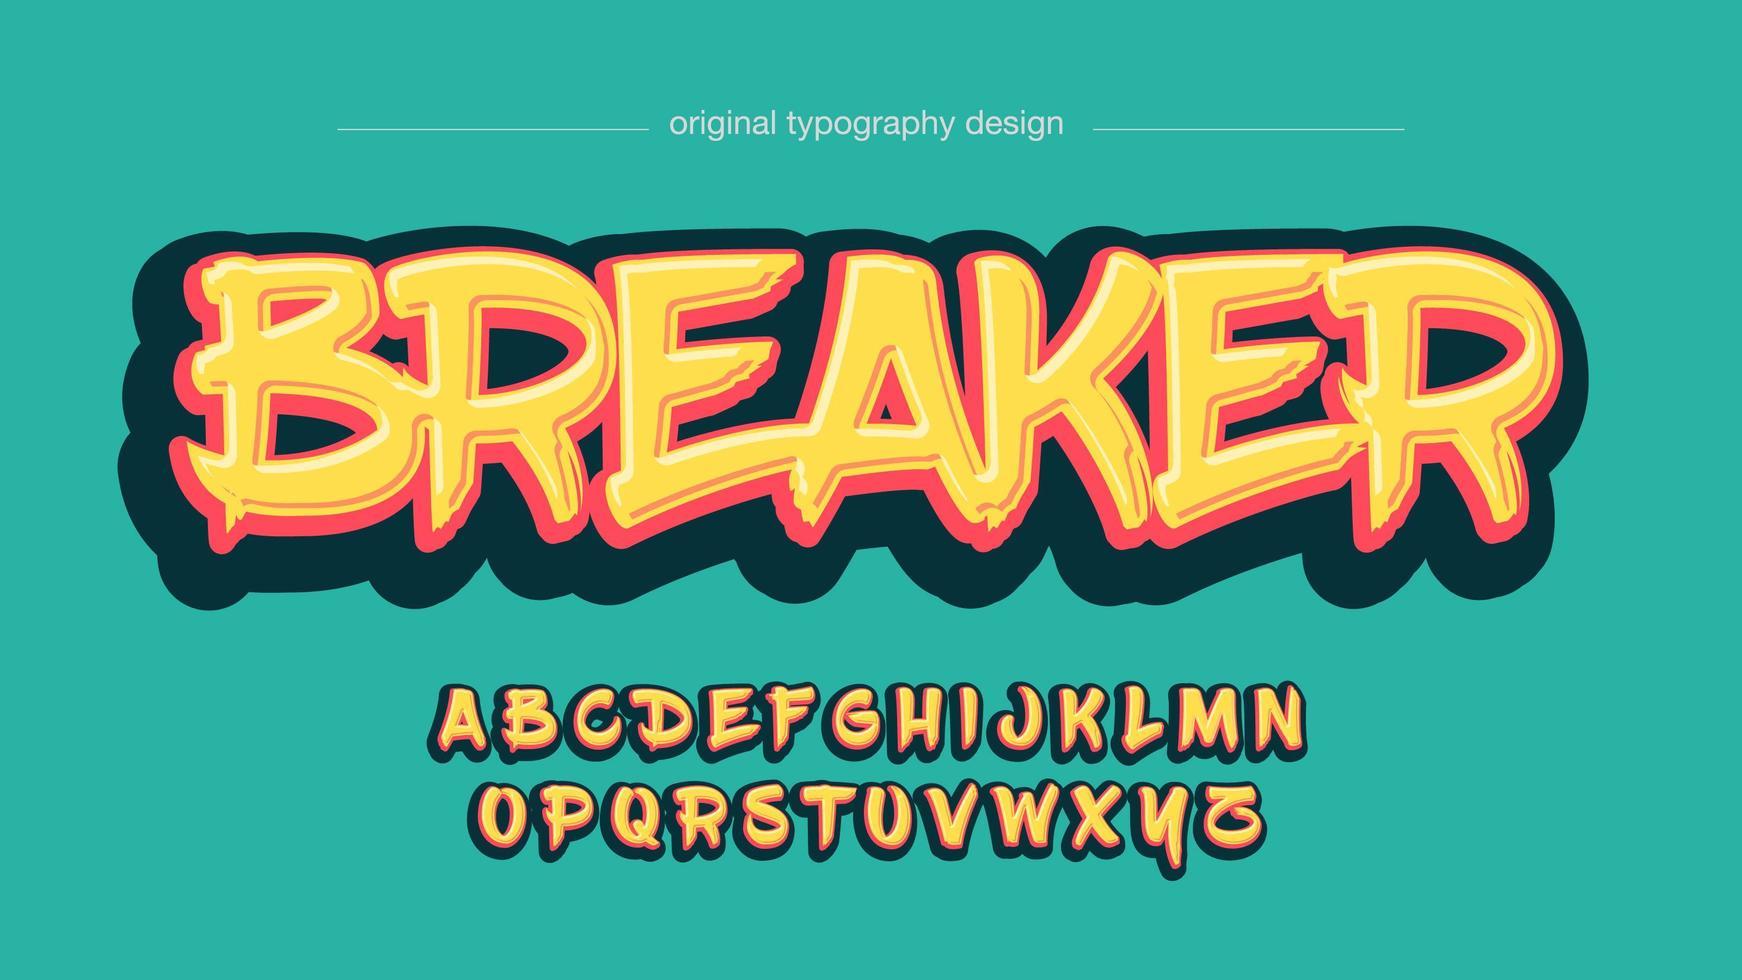 Brush Grafitti Yellow Bold Artistic Font vector